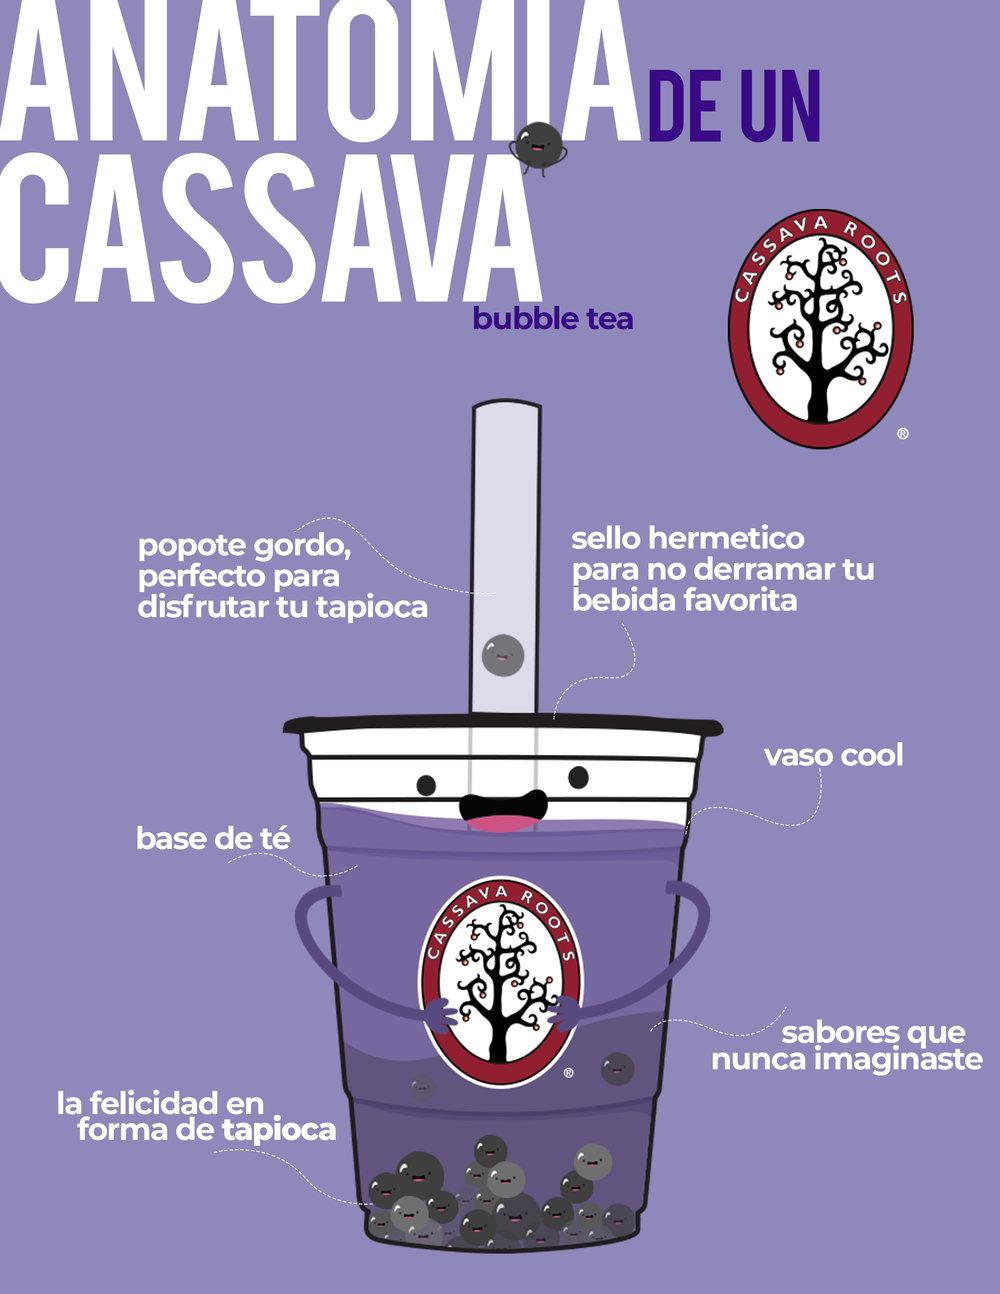 Anatomía Cassava Roots